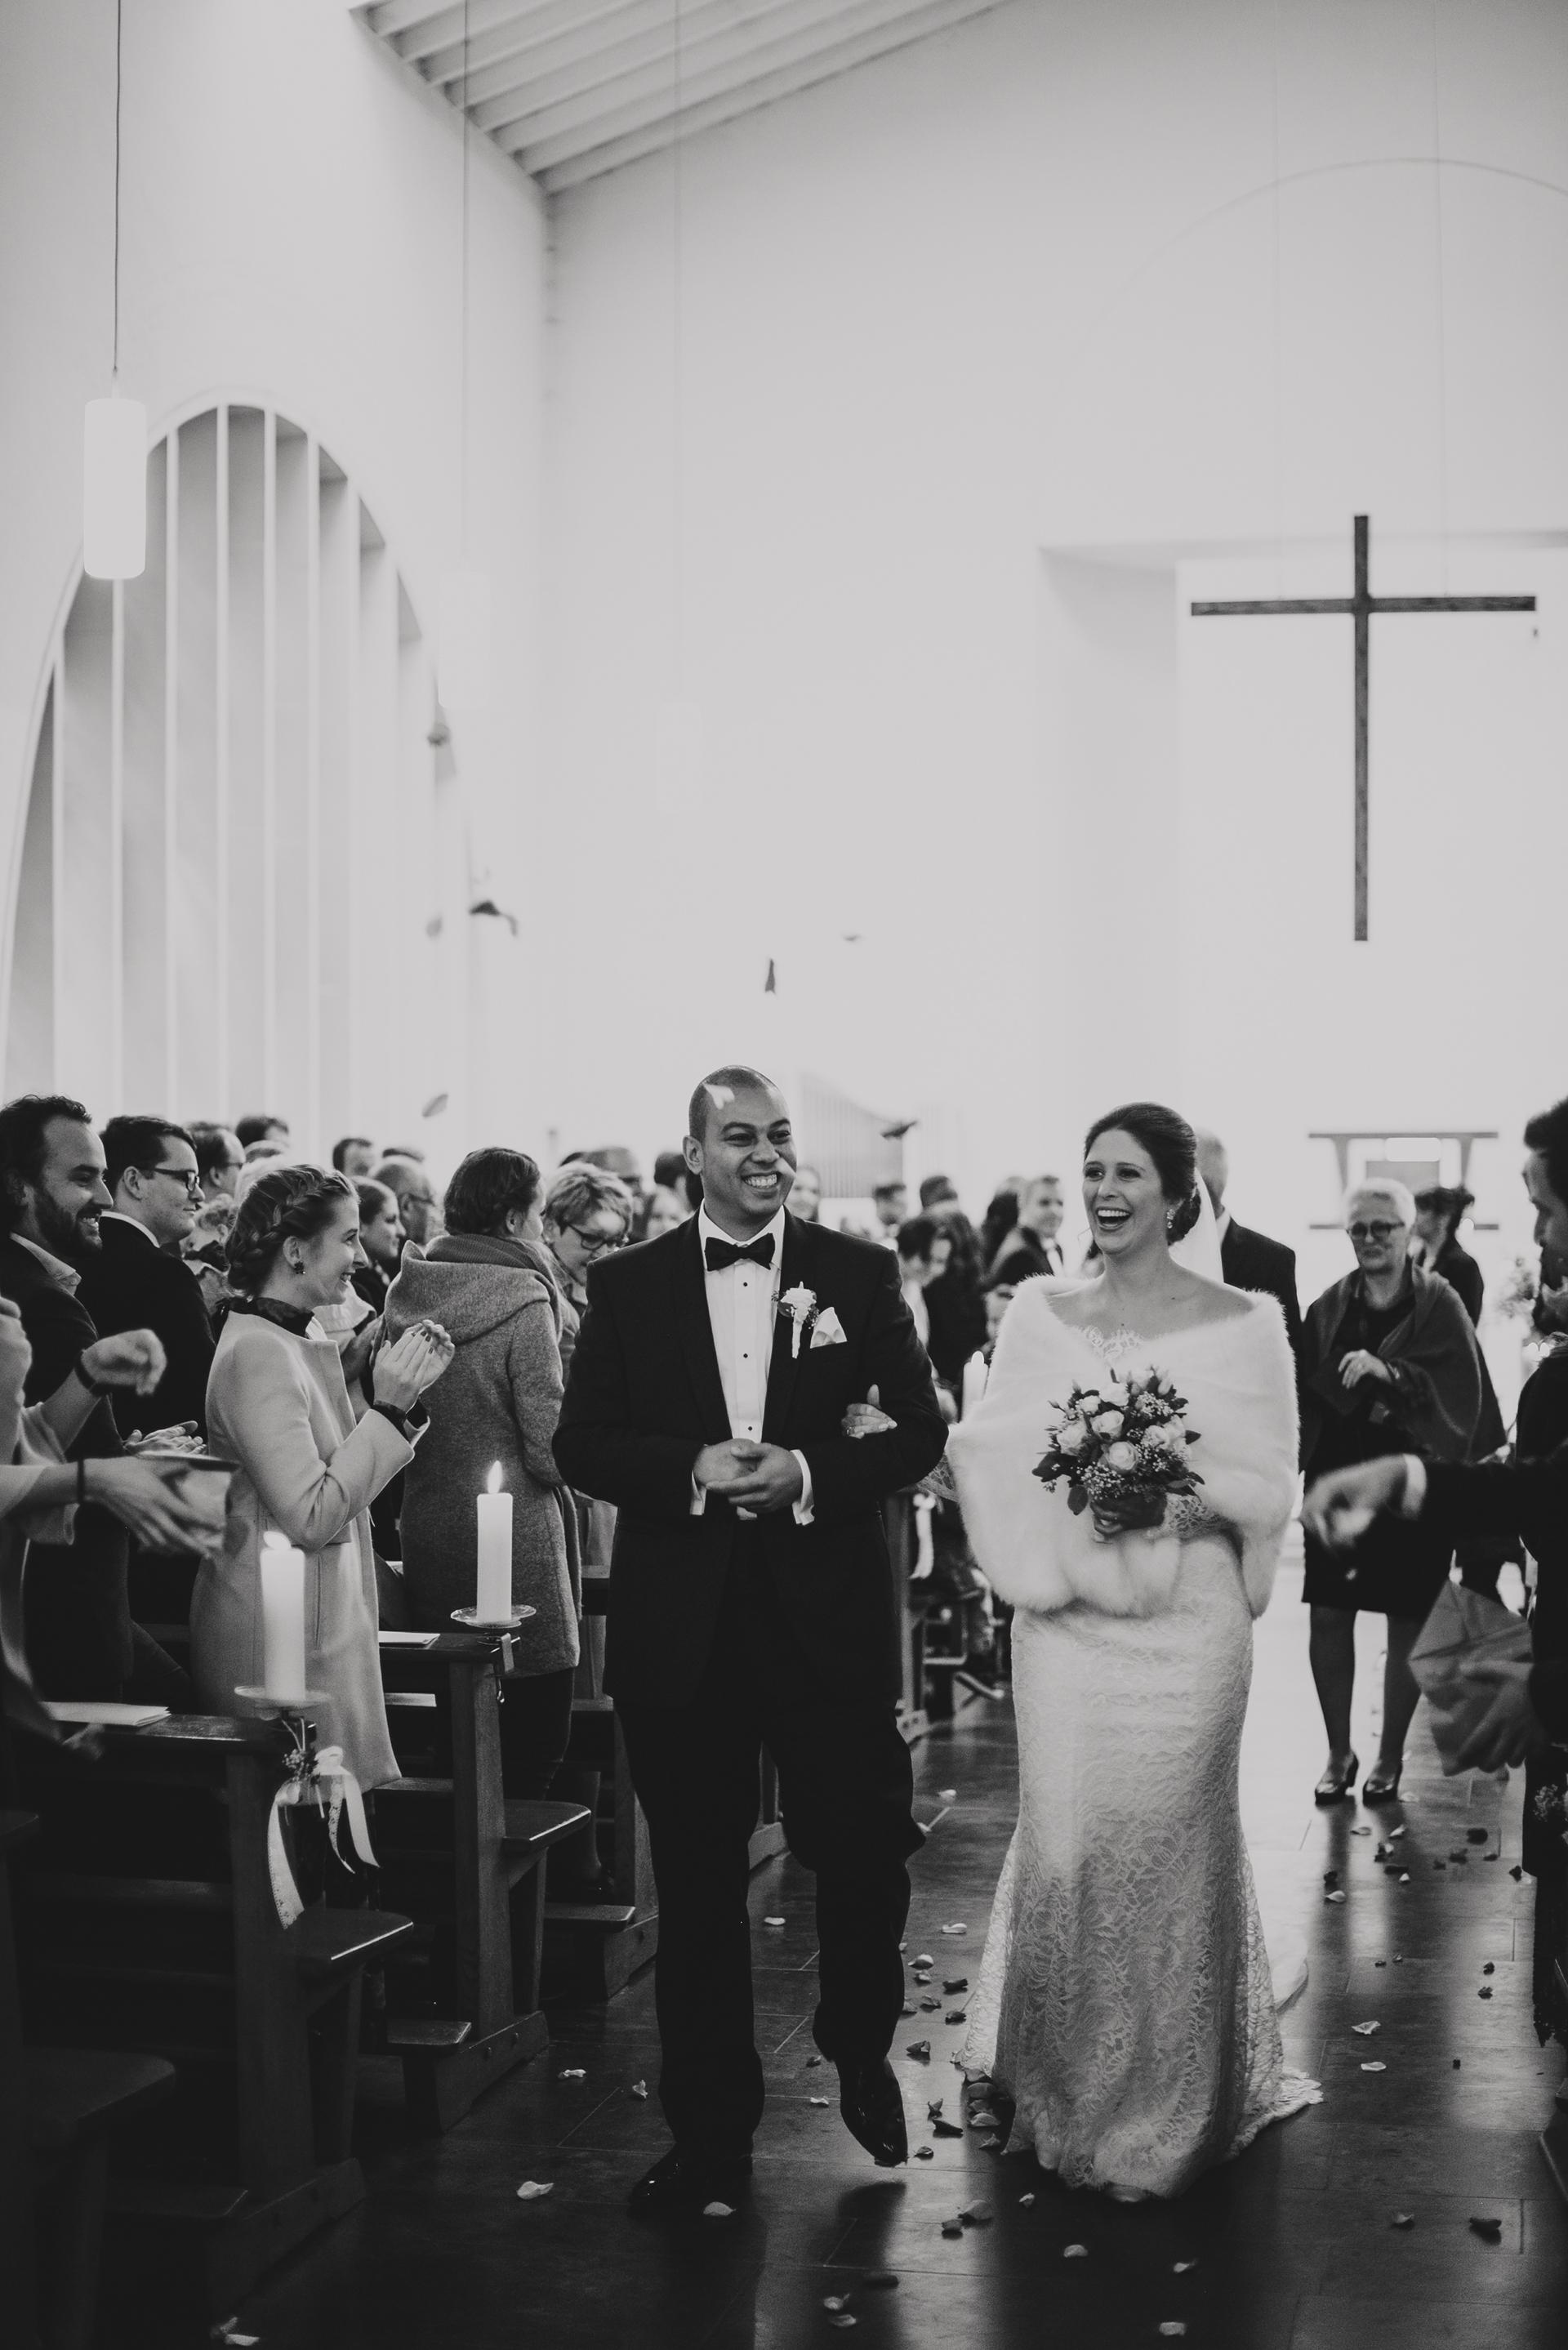 Hochzeitsreportage_J&D_037_Caroline Queda Fotografie